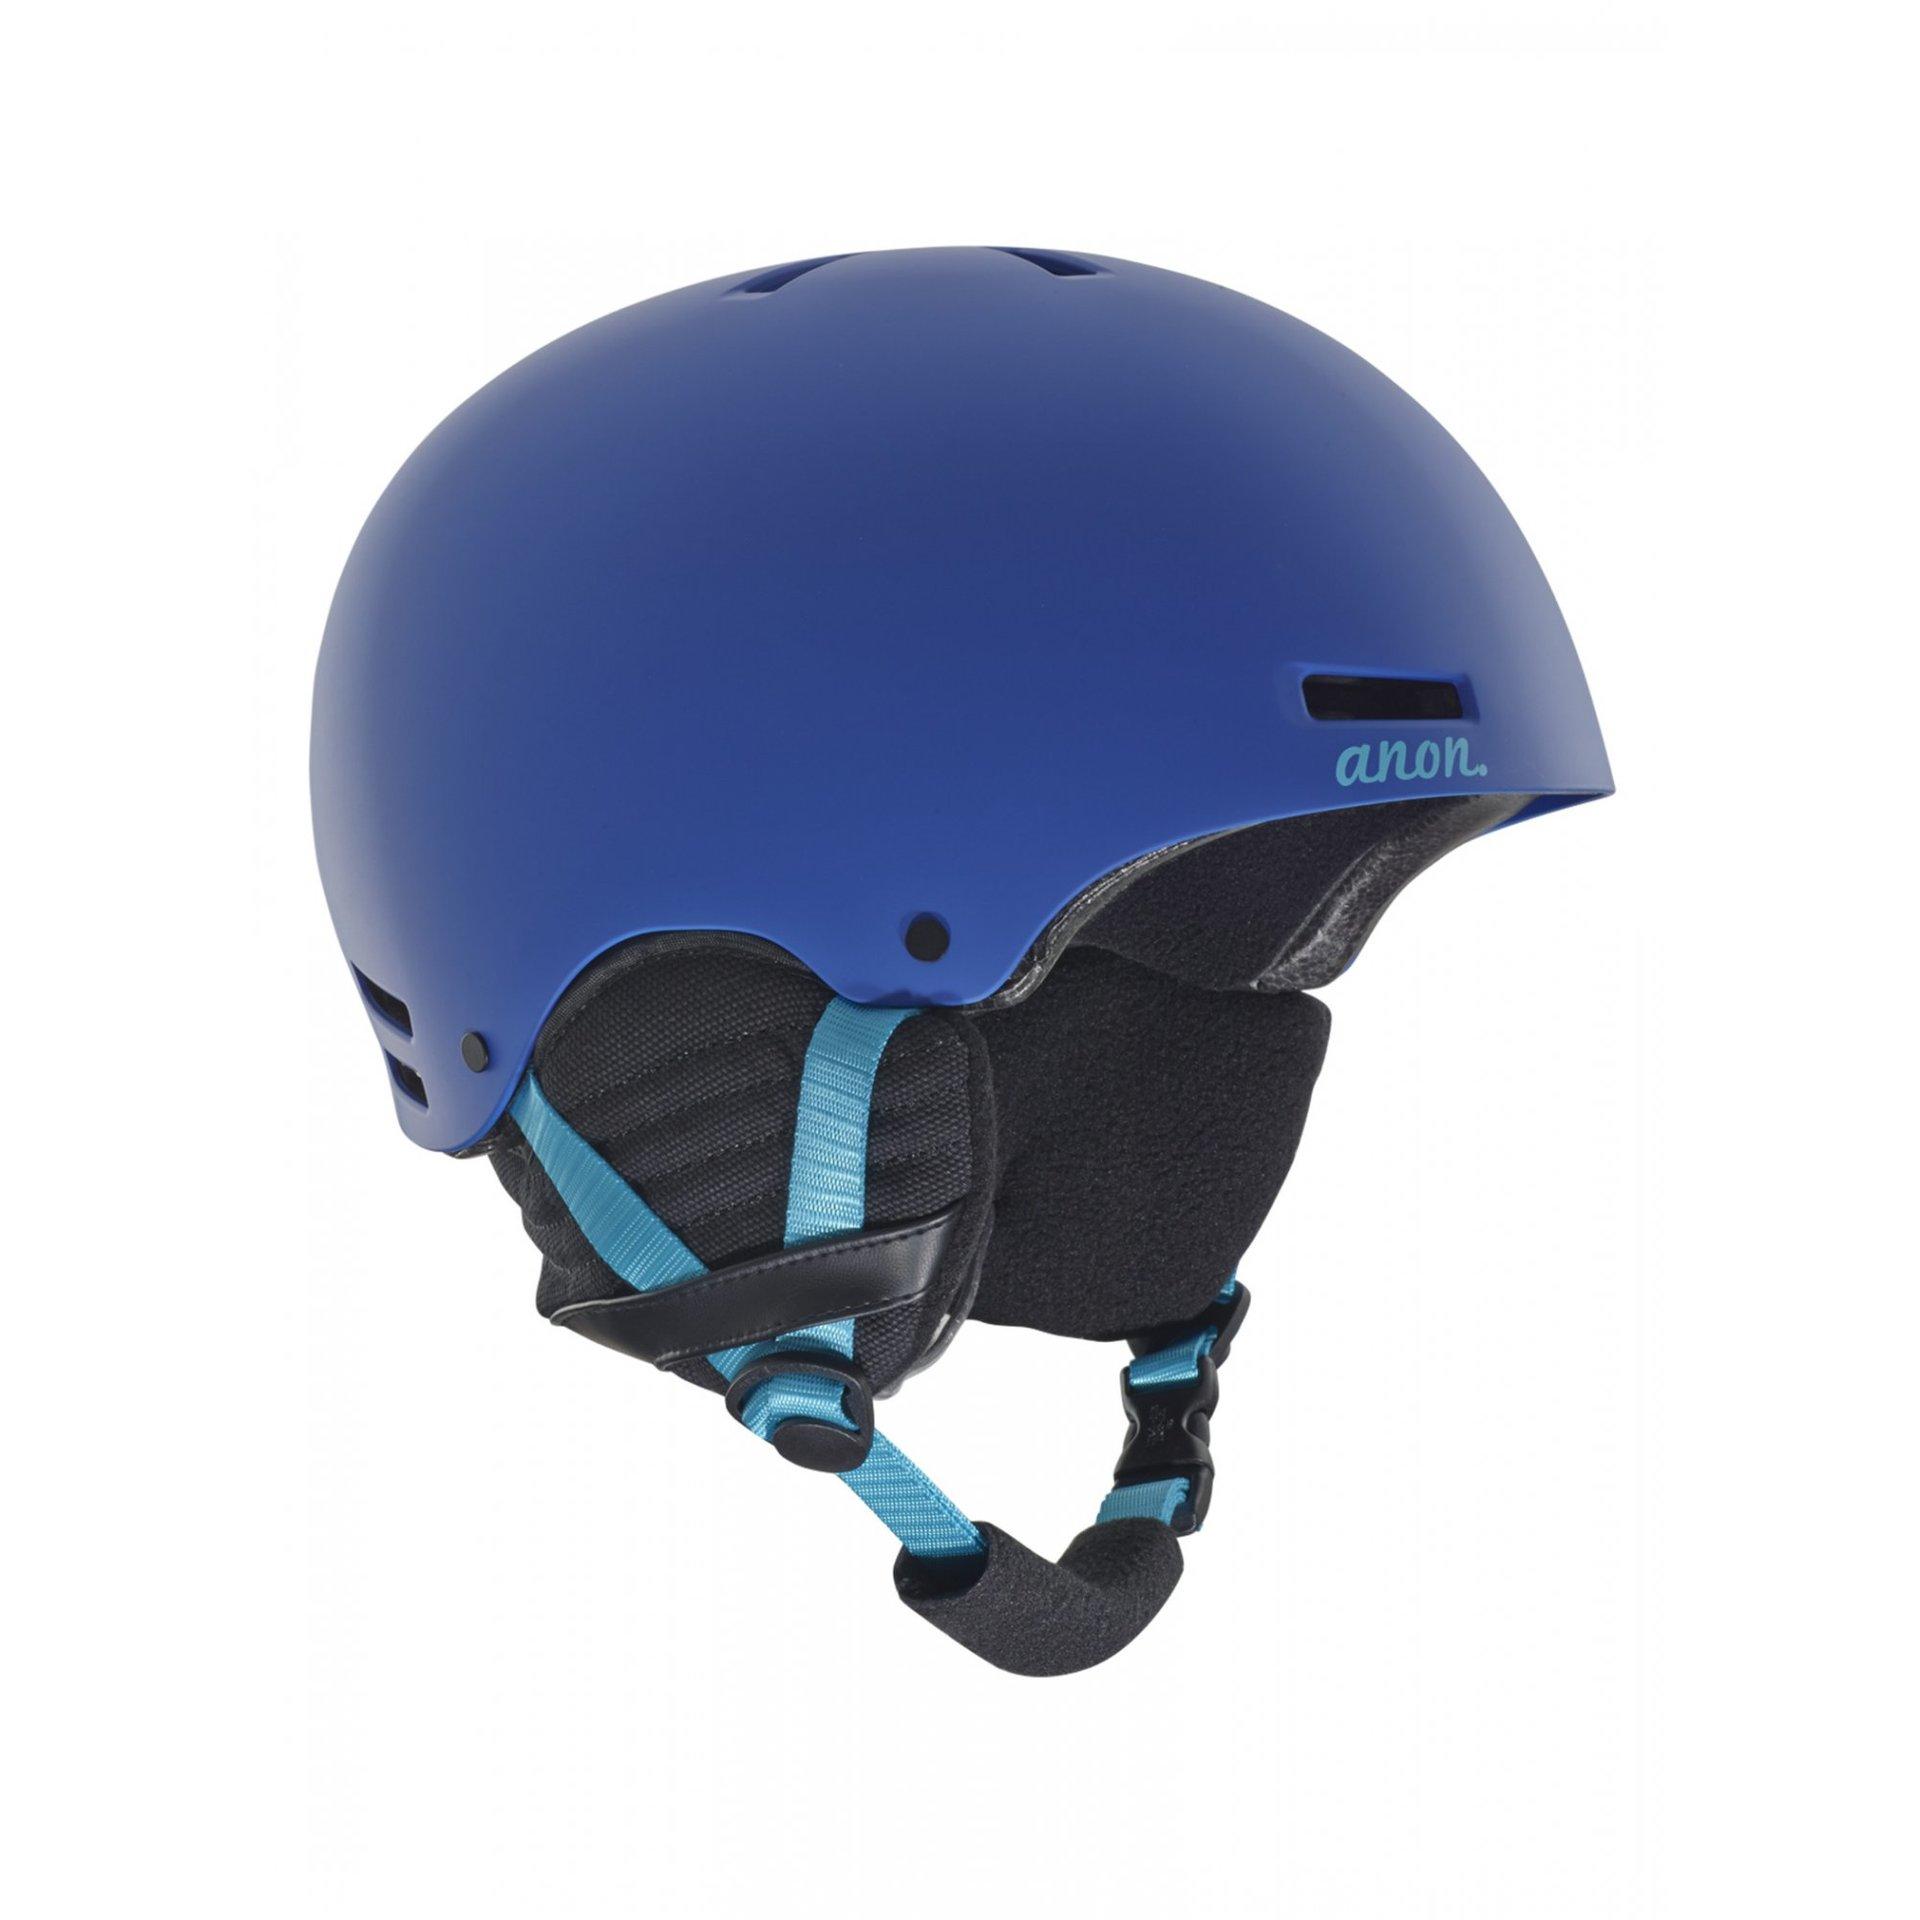 KASK ANON GRETA BLUE 1